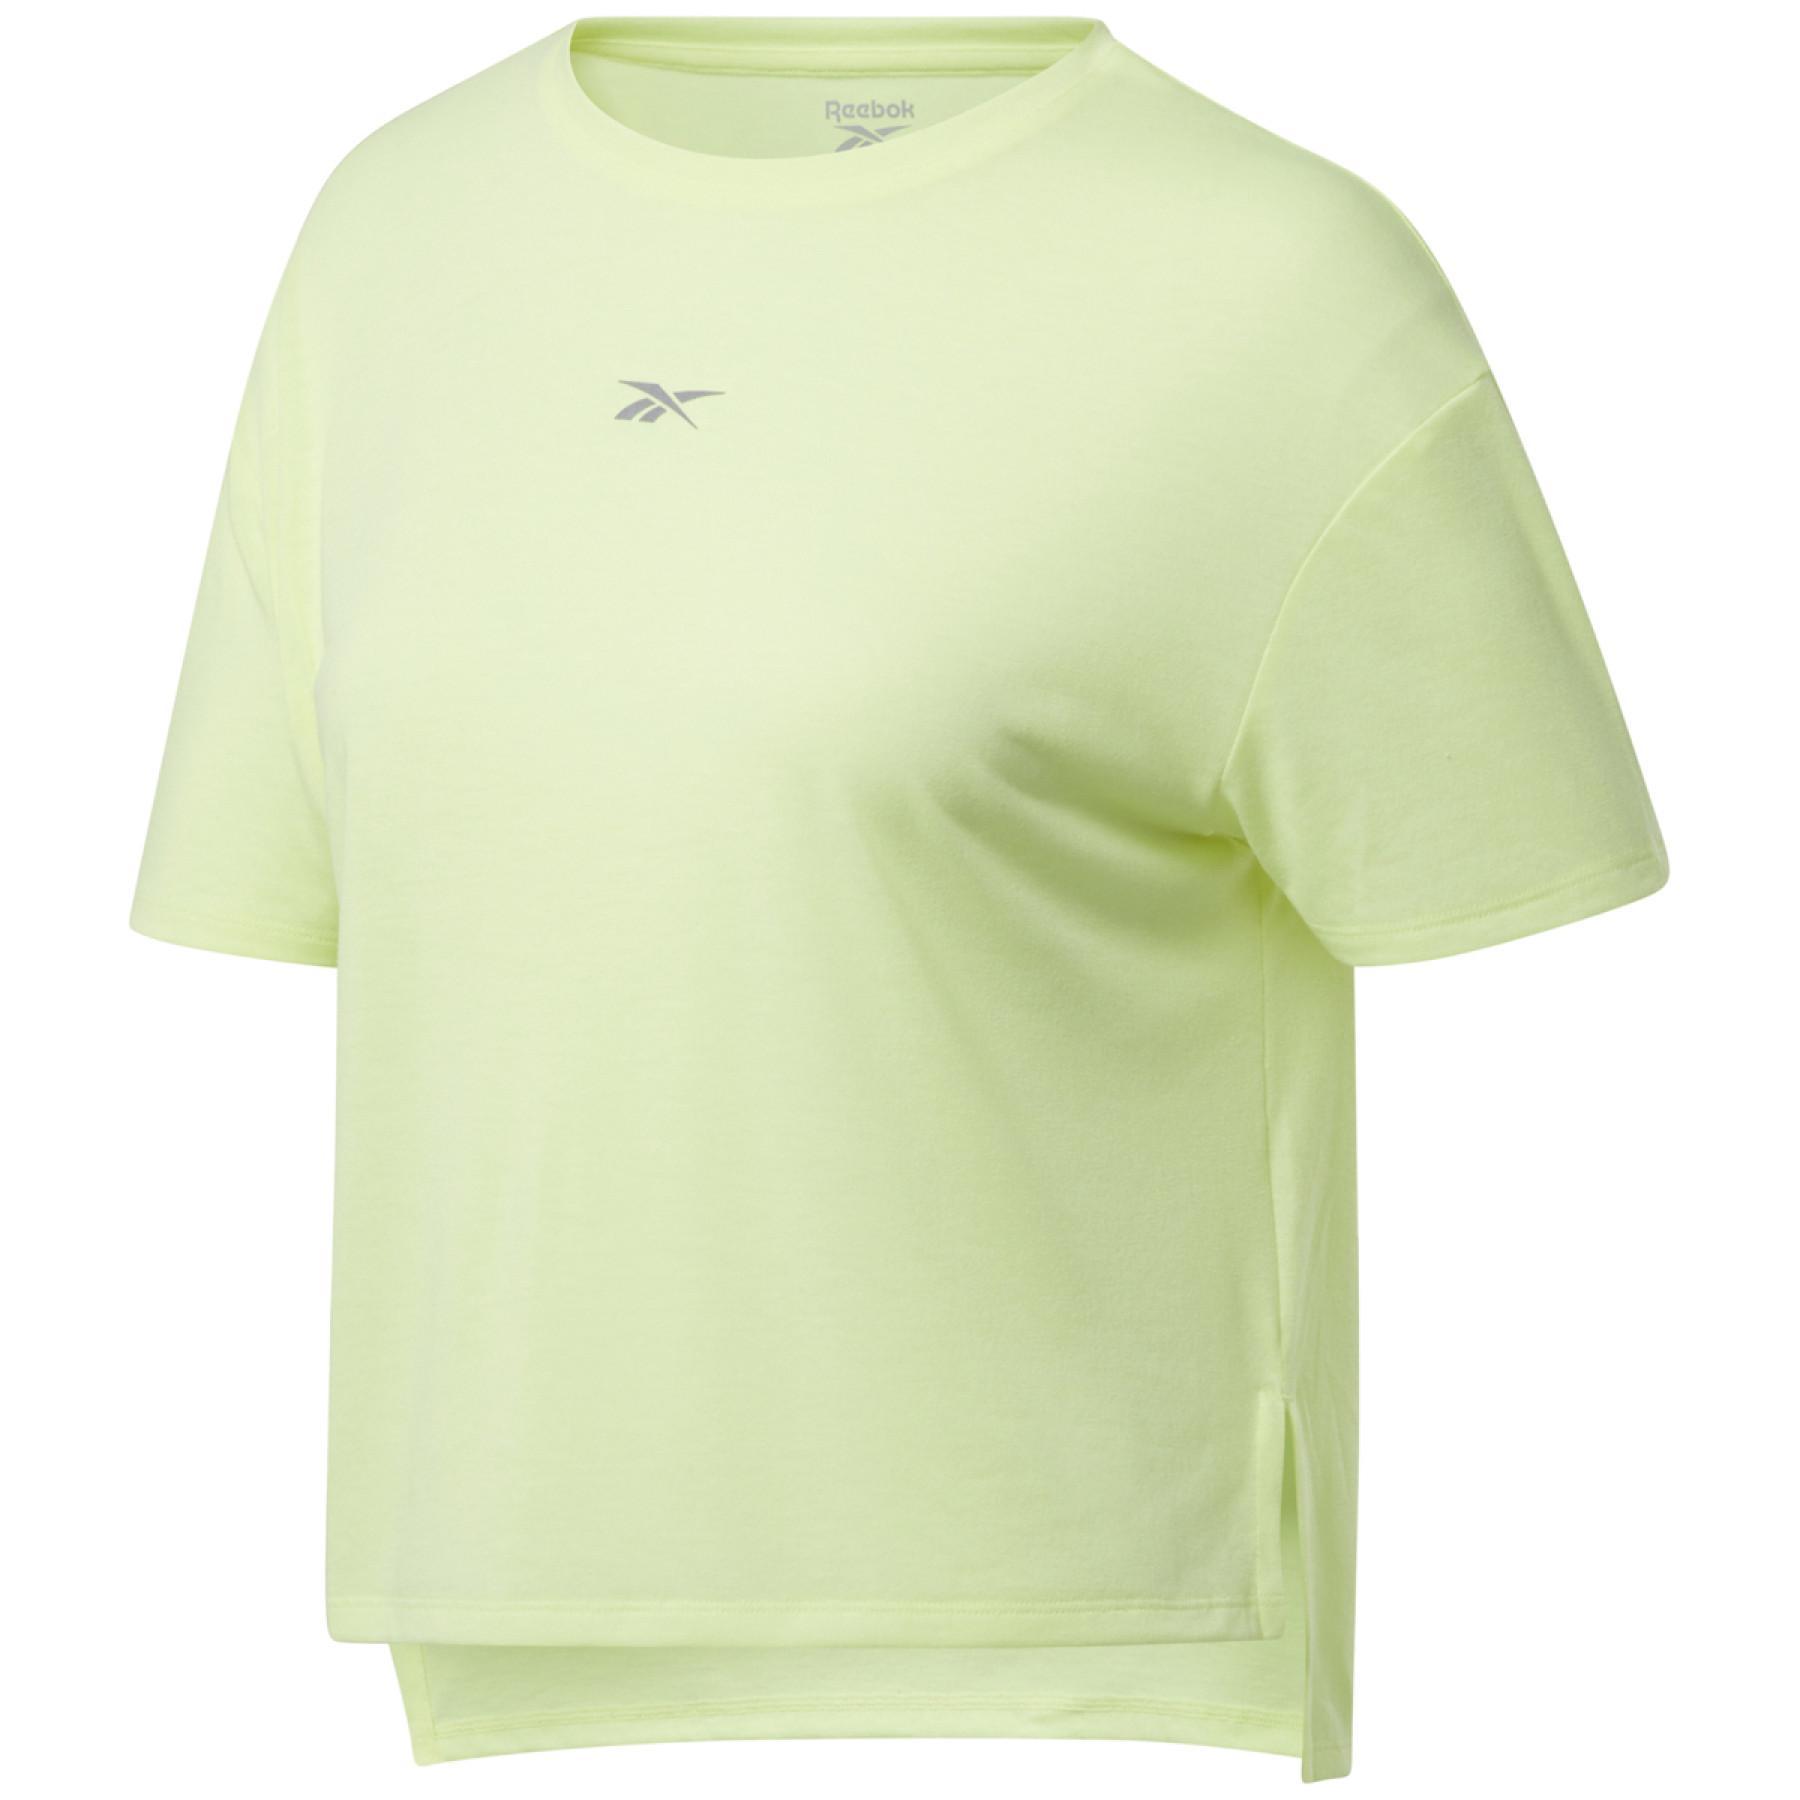 Women's T-shirt Reebok Run Essentials Sleeve Graphic